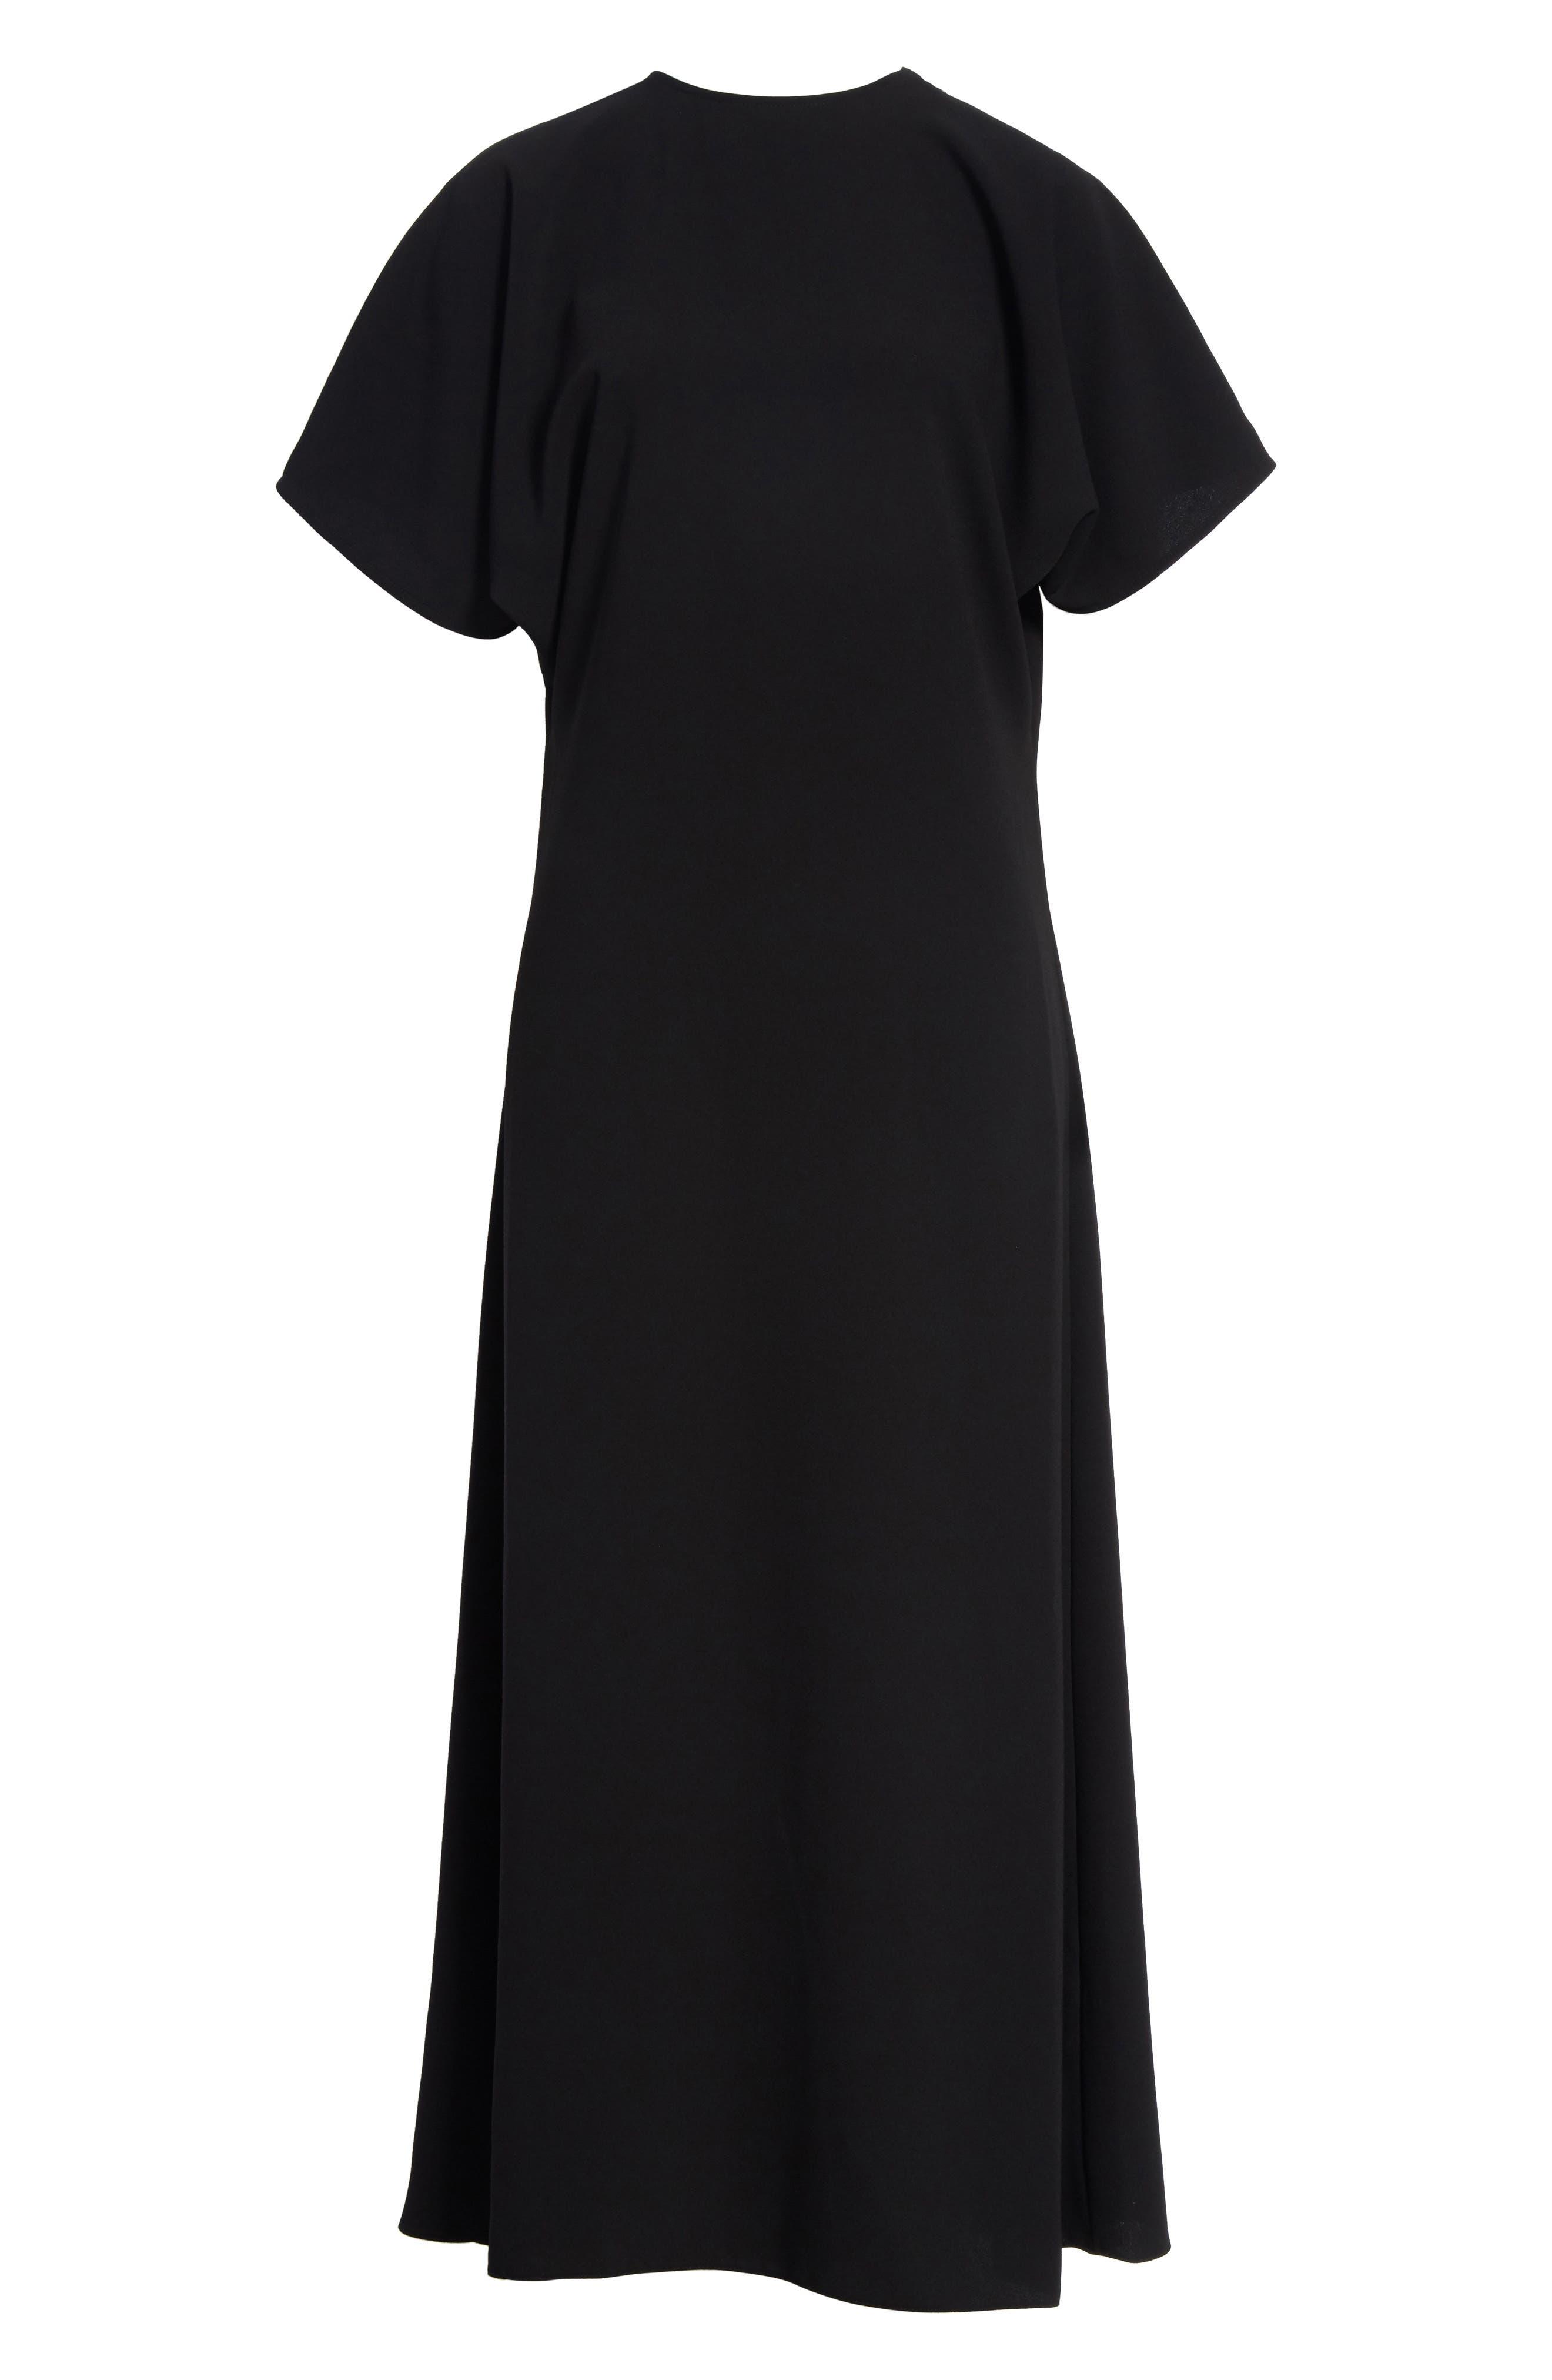 J.W.ANDERSON Cap Sleeve Maxi Dress,                             Alternate thumbnail 6, color,                             001